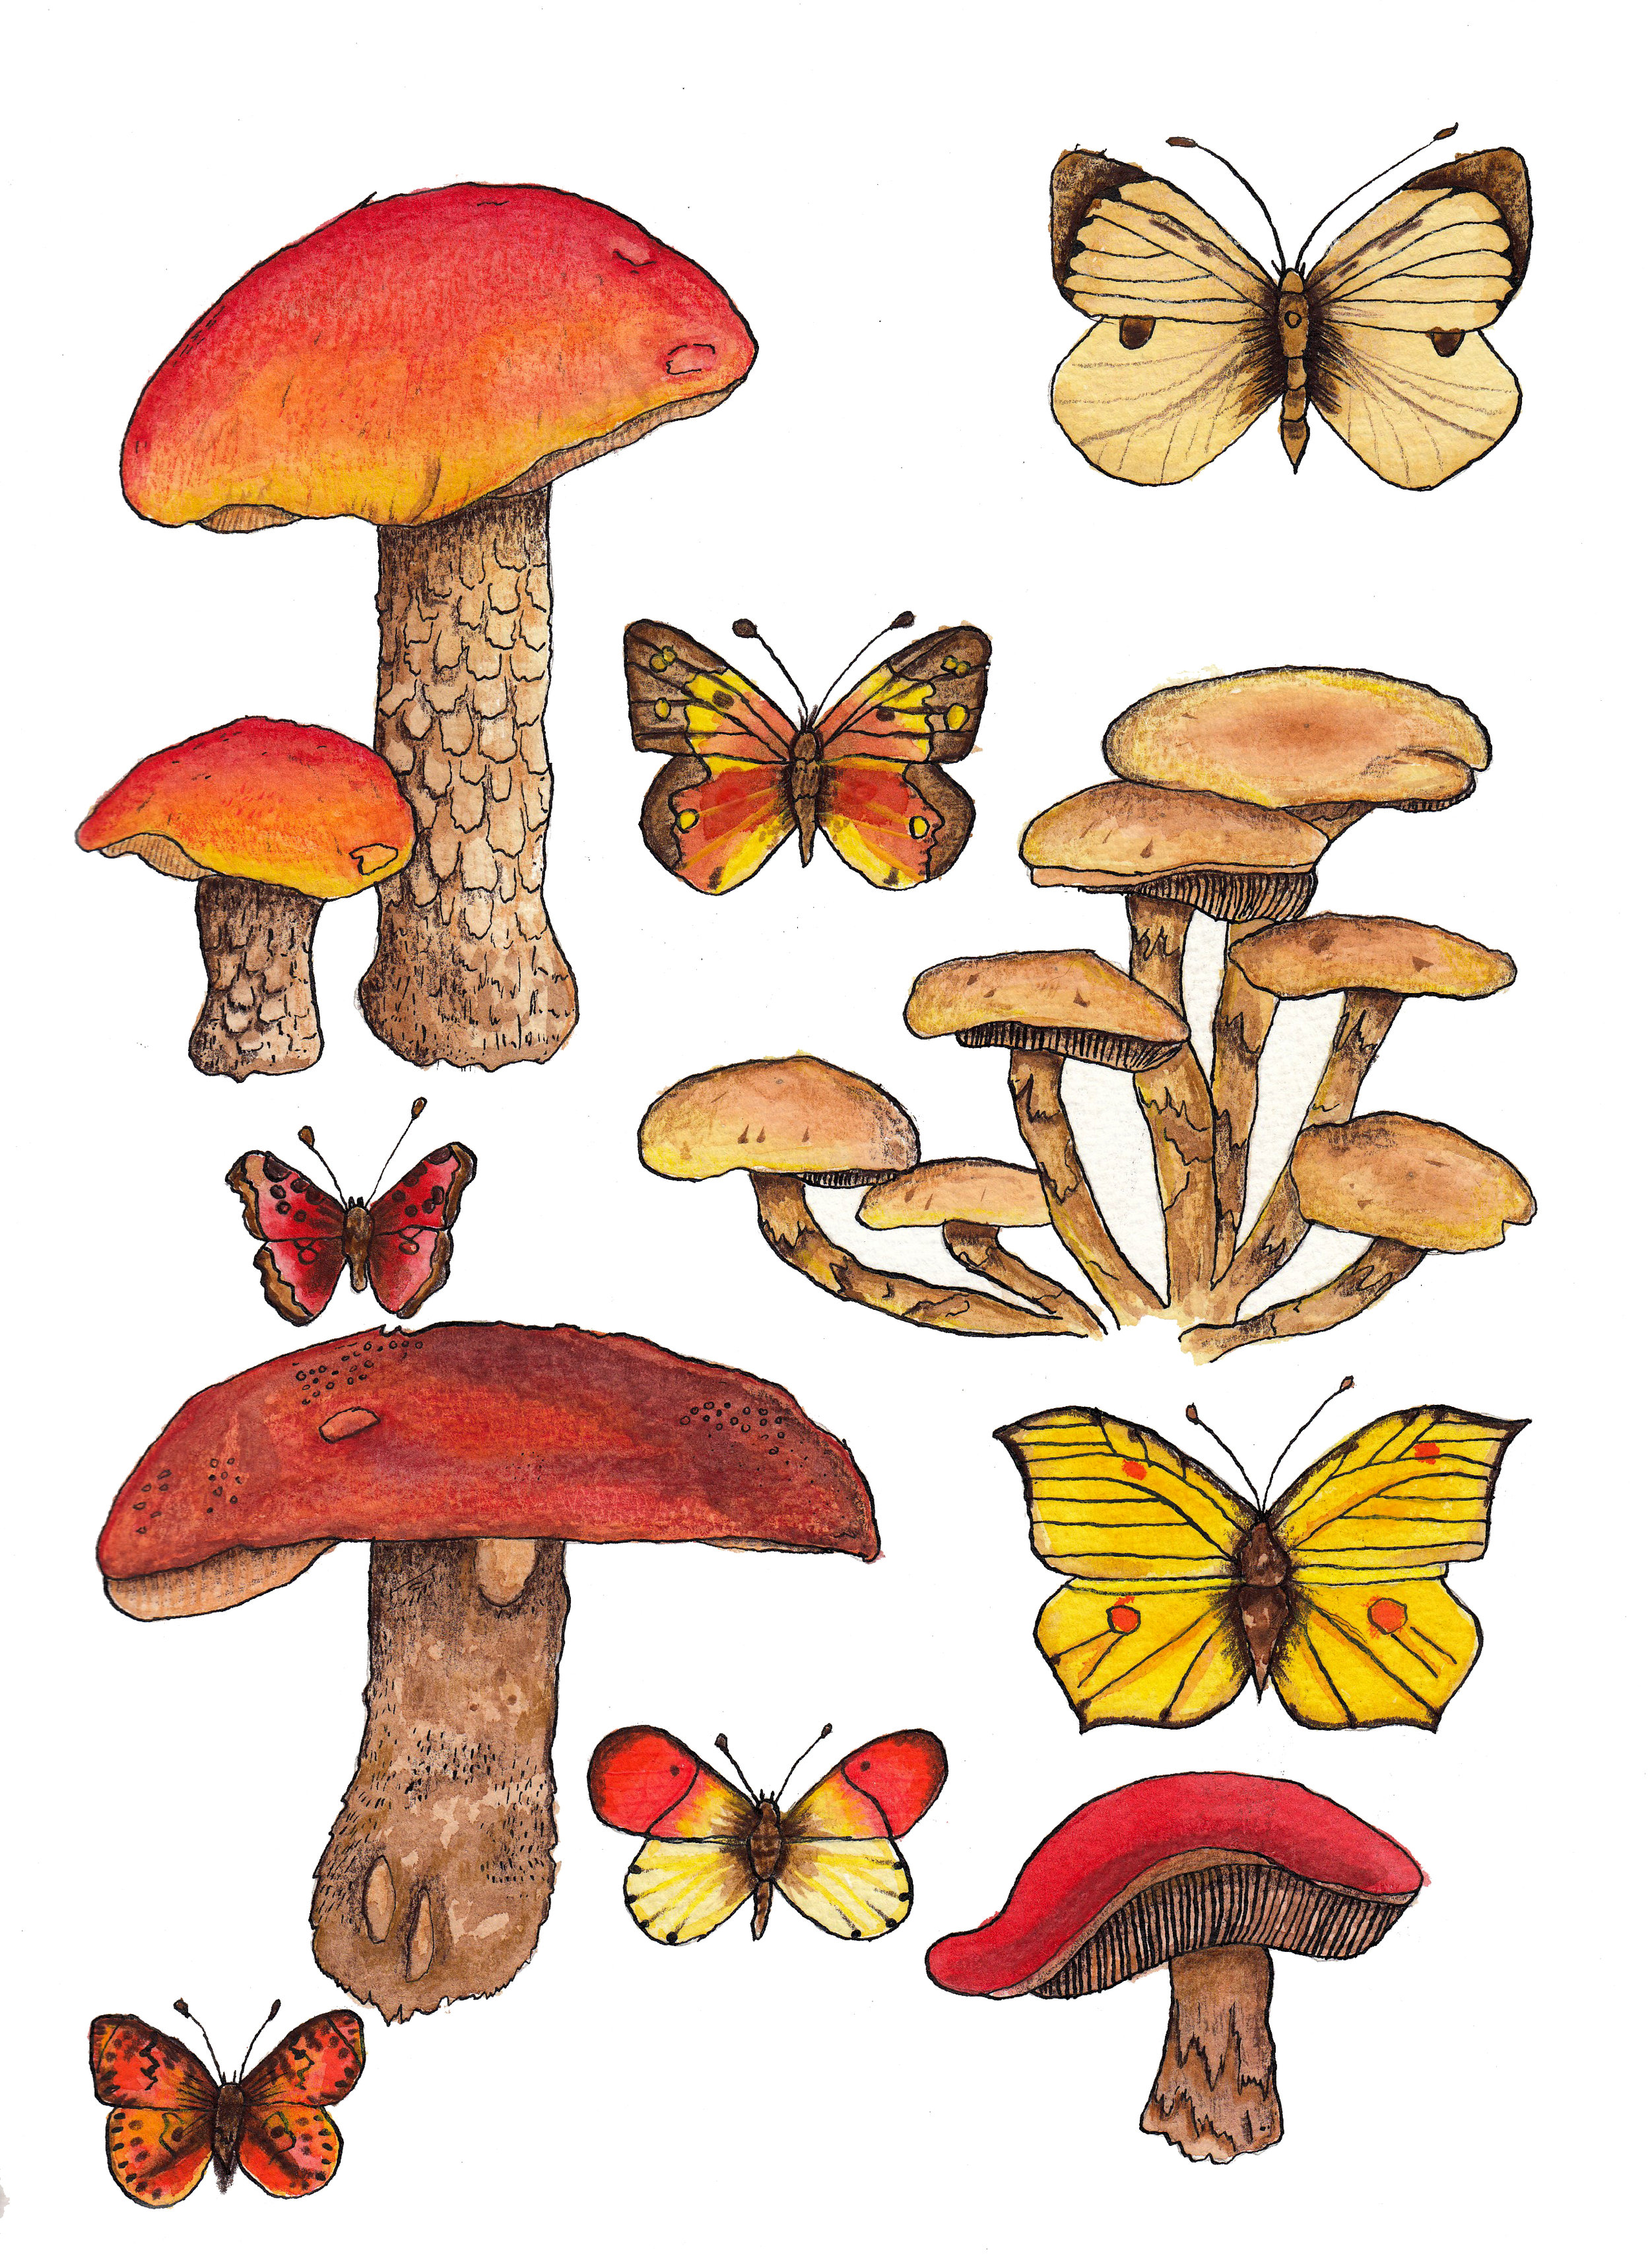 mushrooms and buterflys.jpg